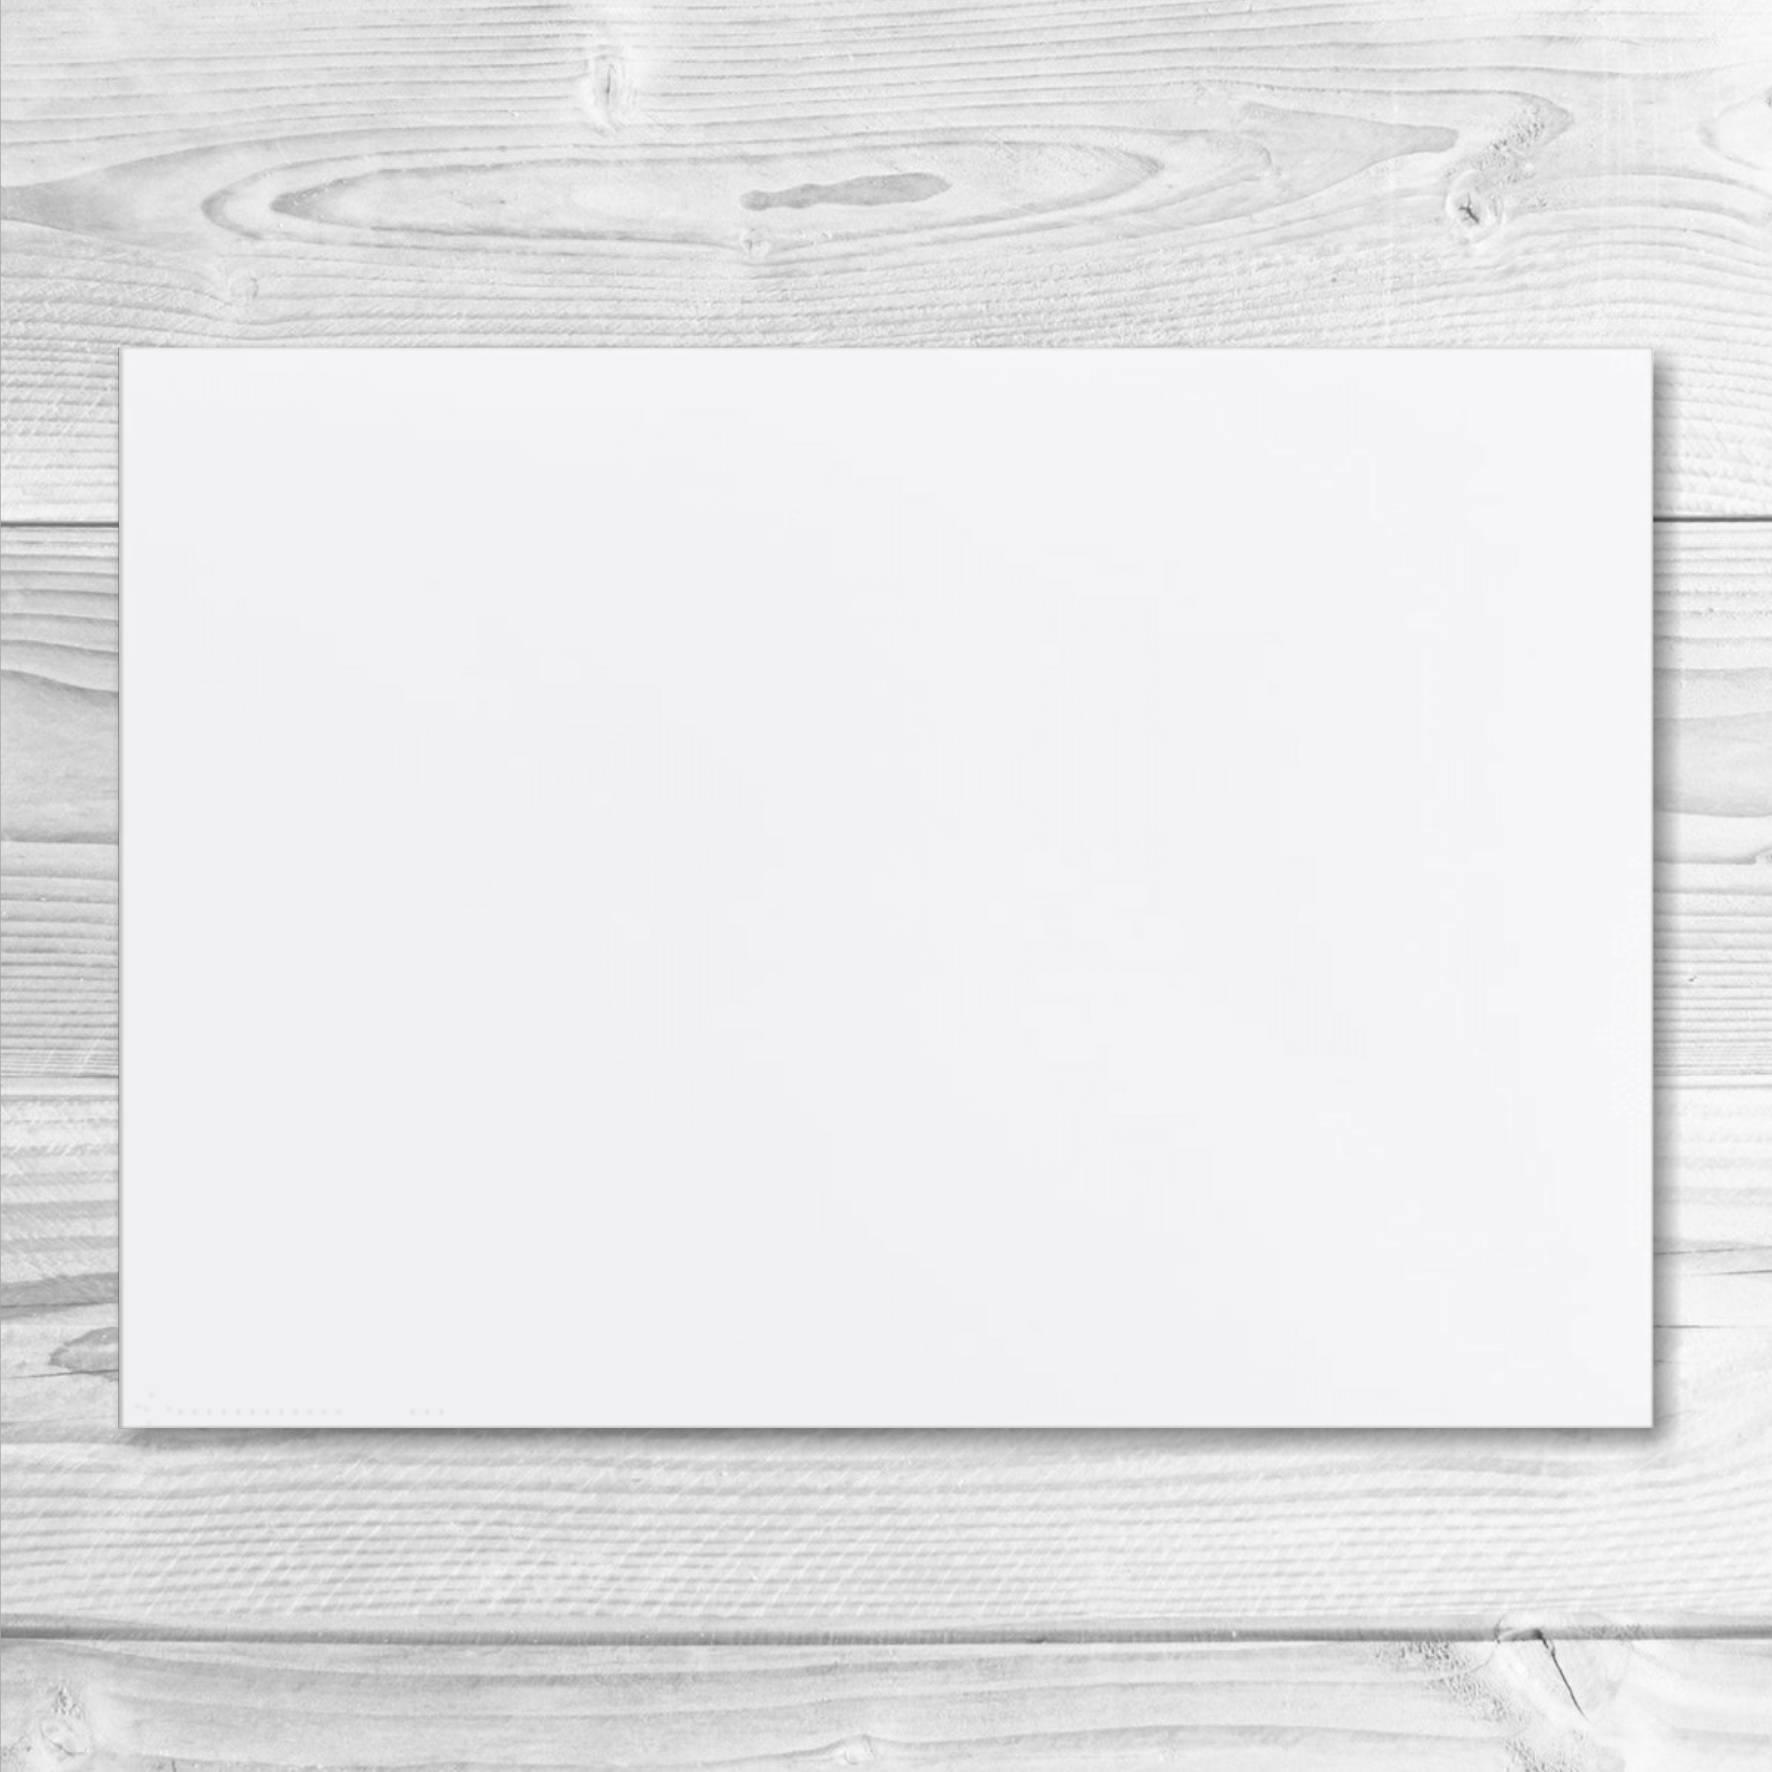 133 x 184 blanc 2